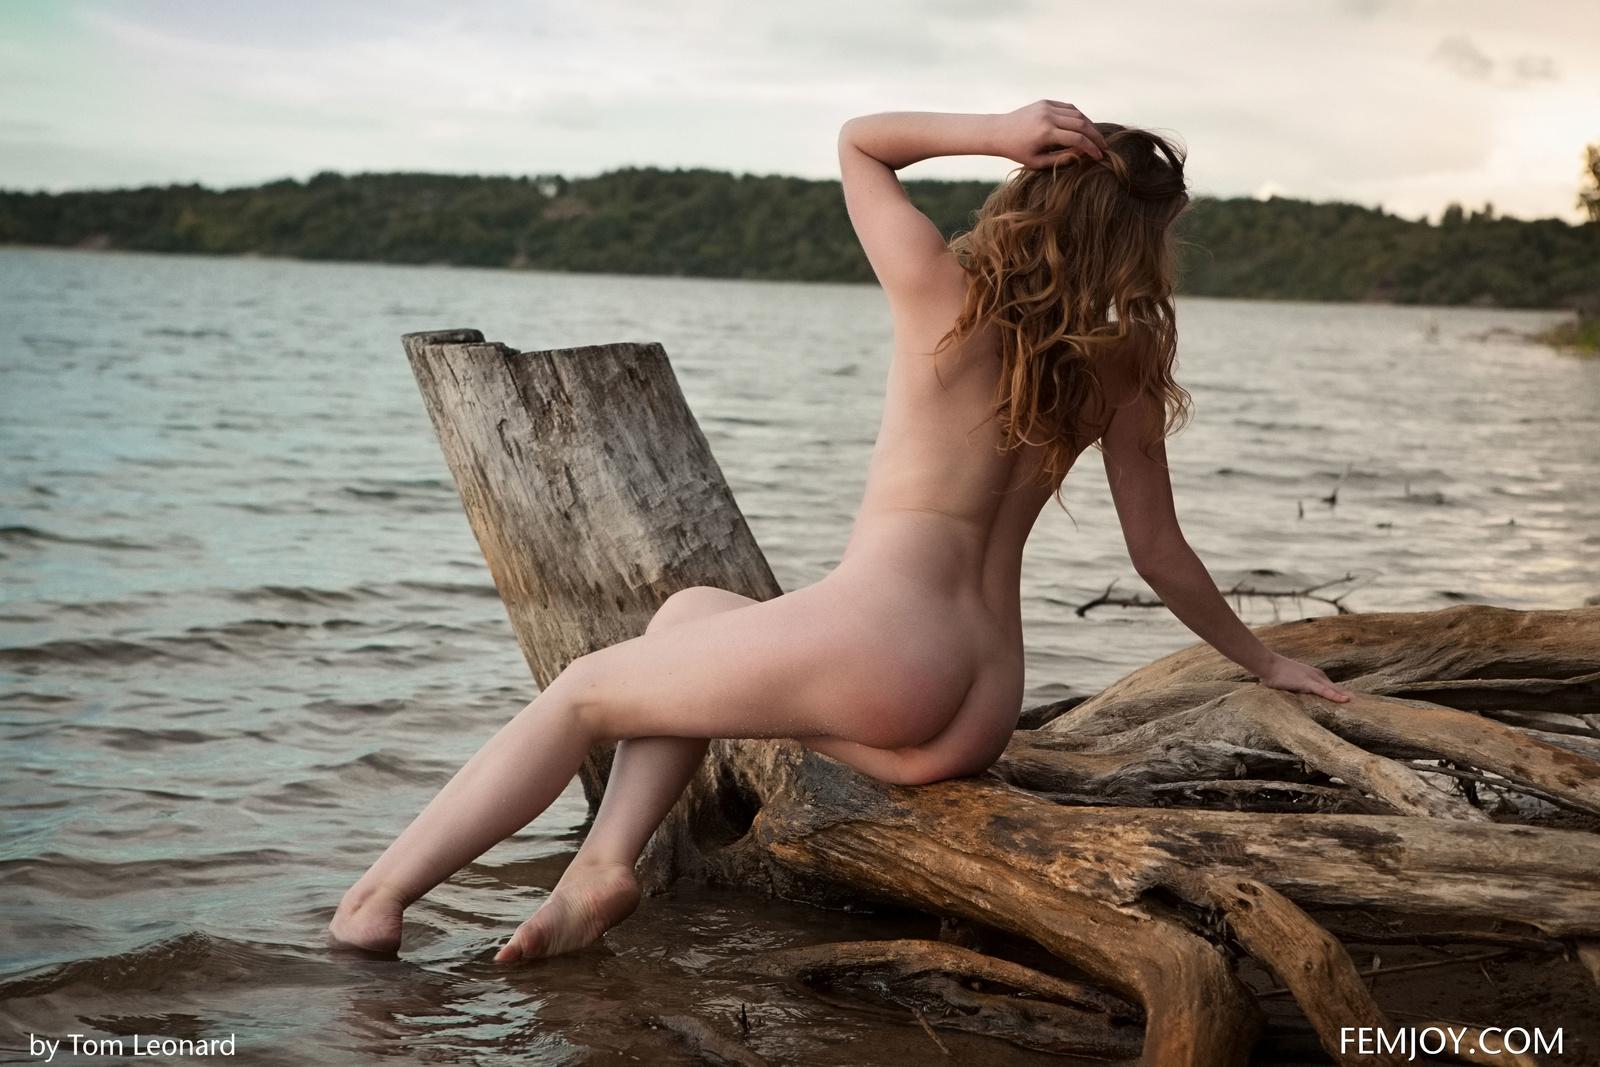 Zdjęcie porno - 094 - Zgrabna i naga laska nad jeziorkiem